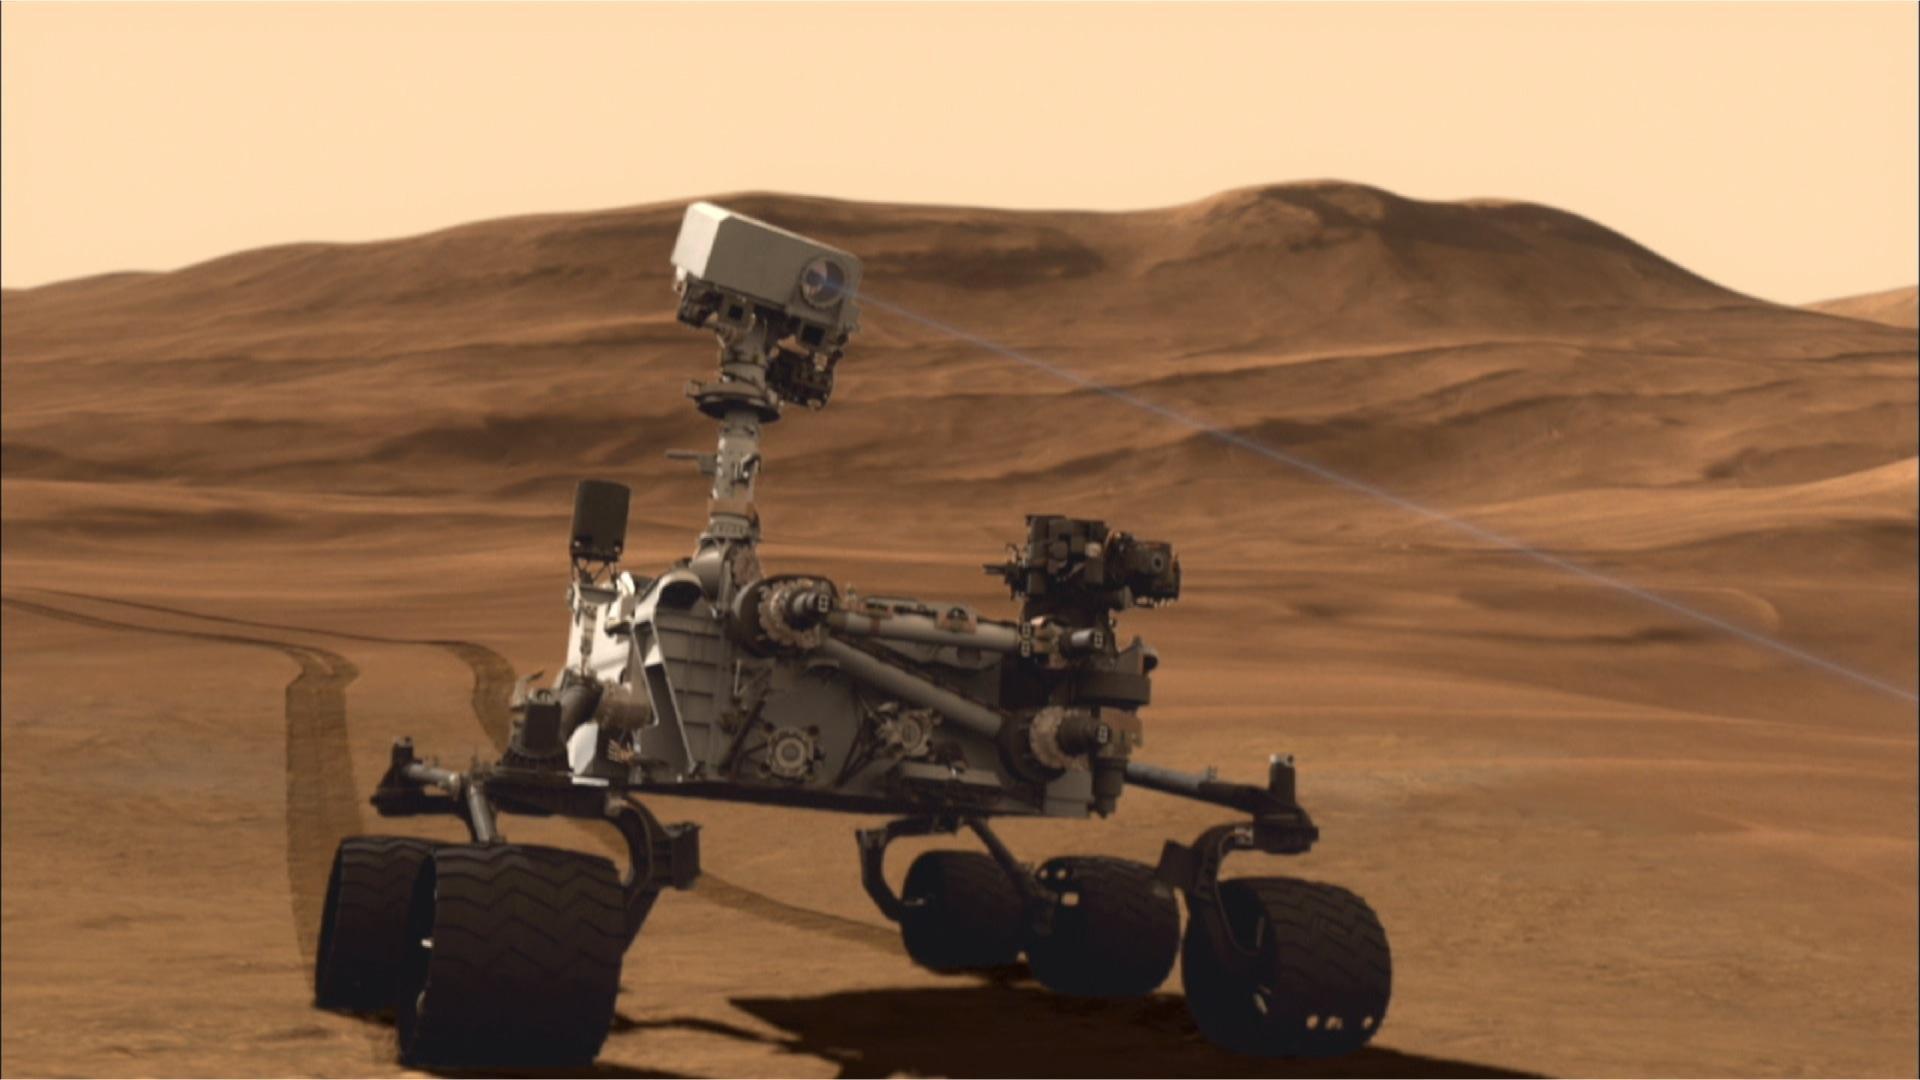 Curiosity: A Robotic Geologist